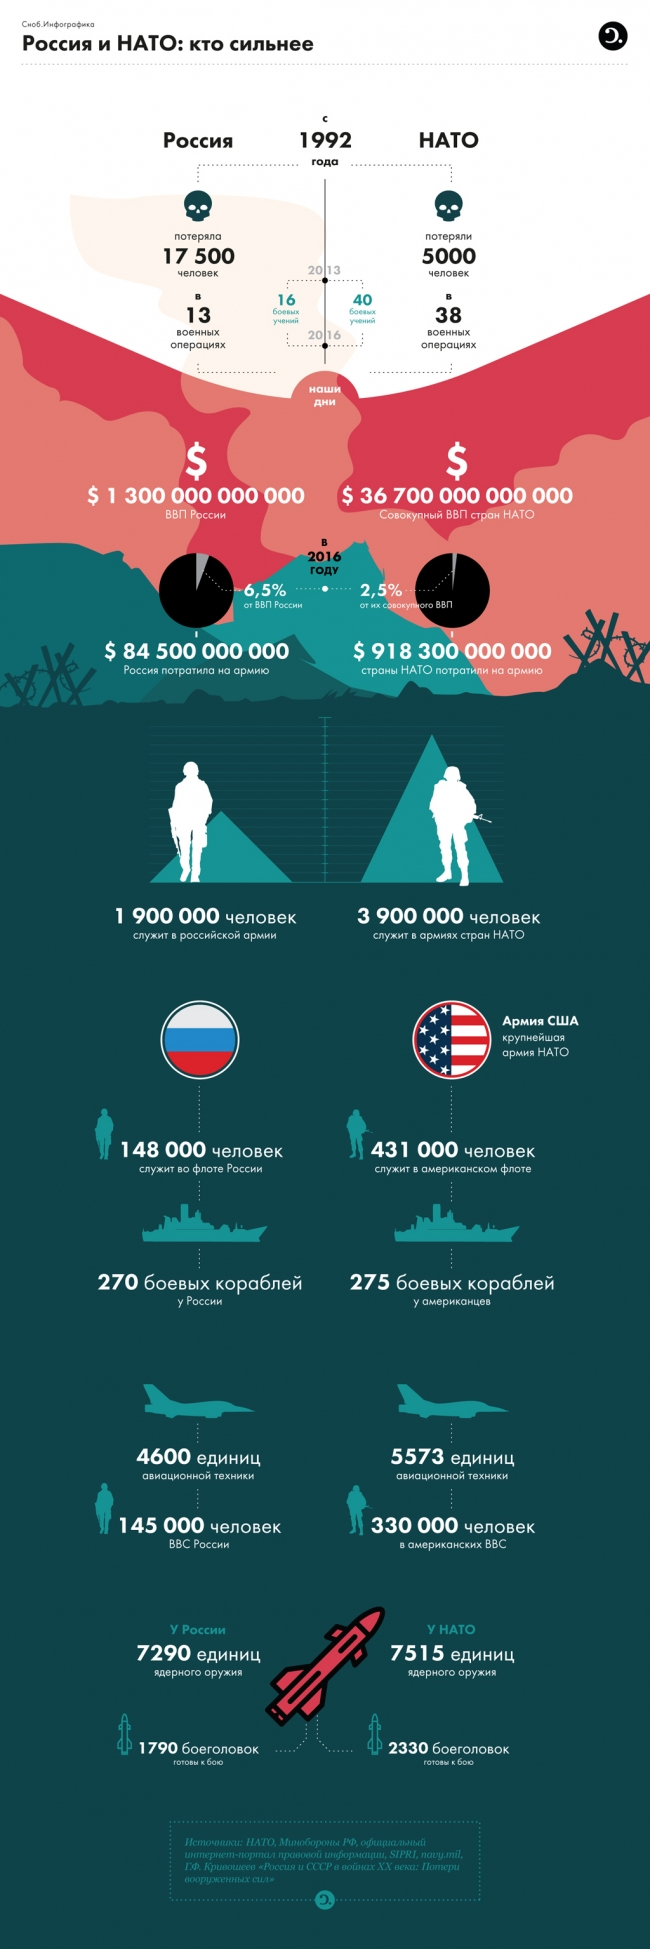 Россия против НАТО